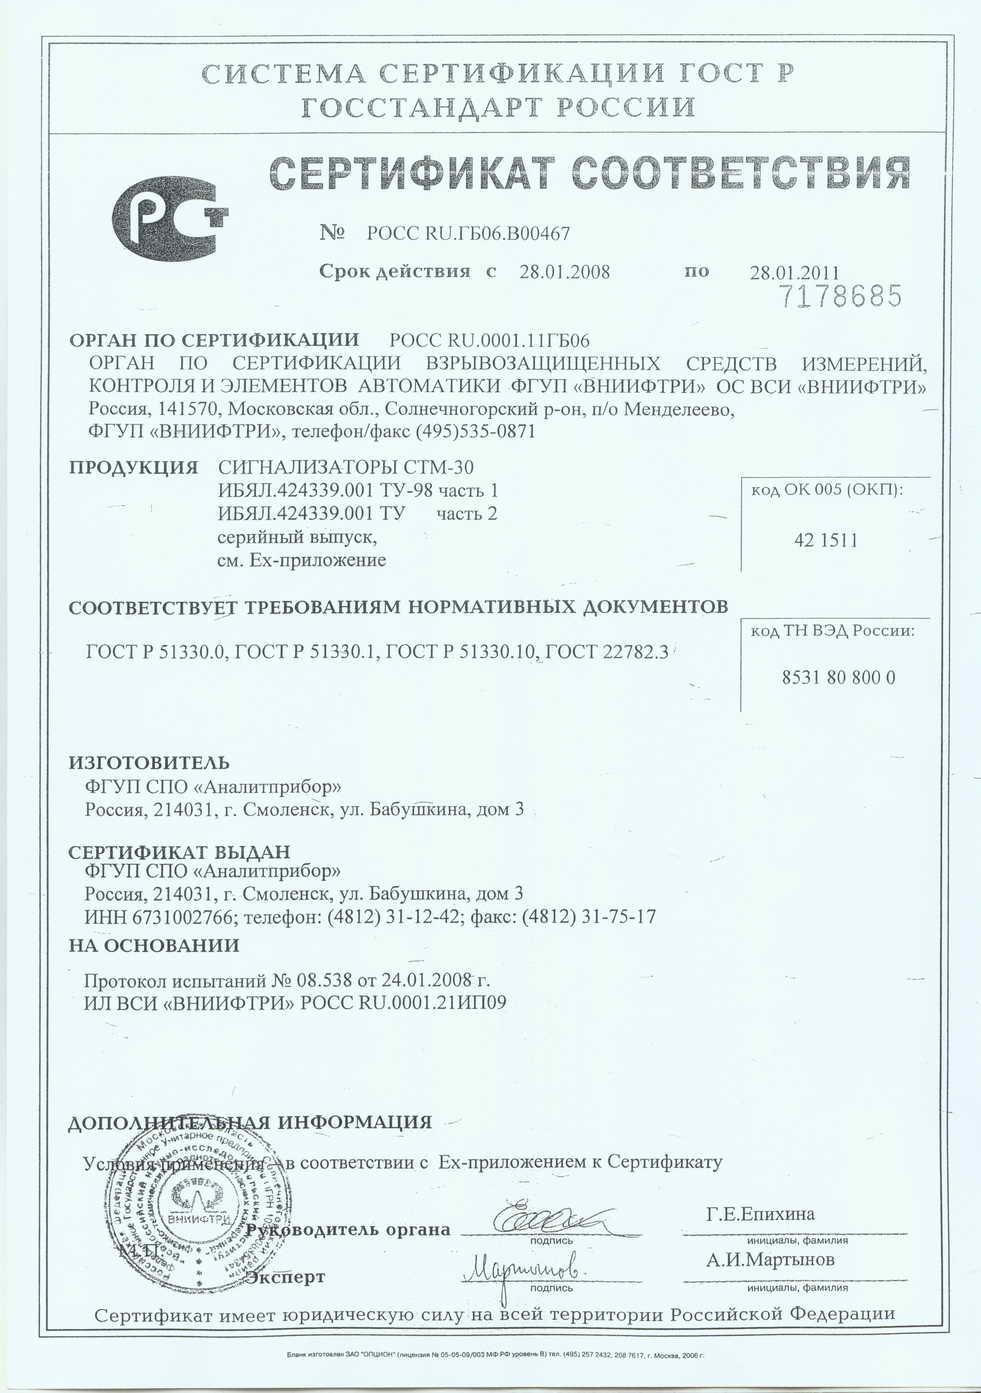 стм 30-50 разрешение на применение